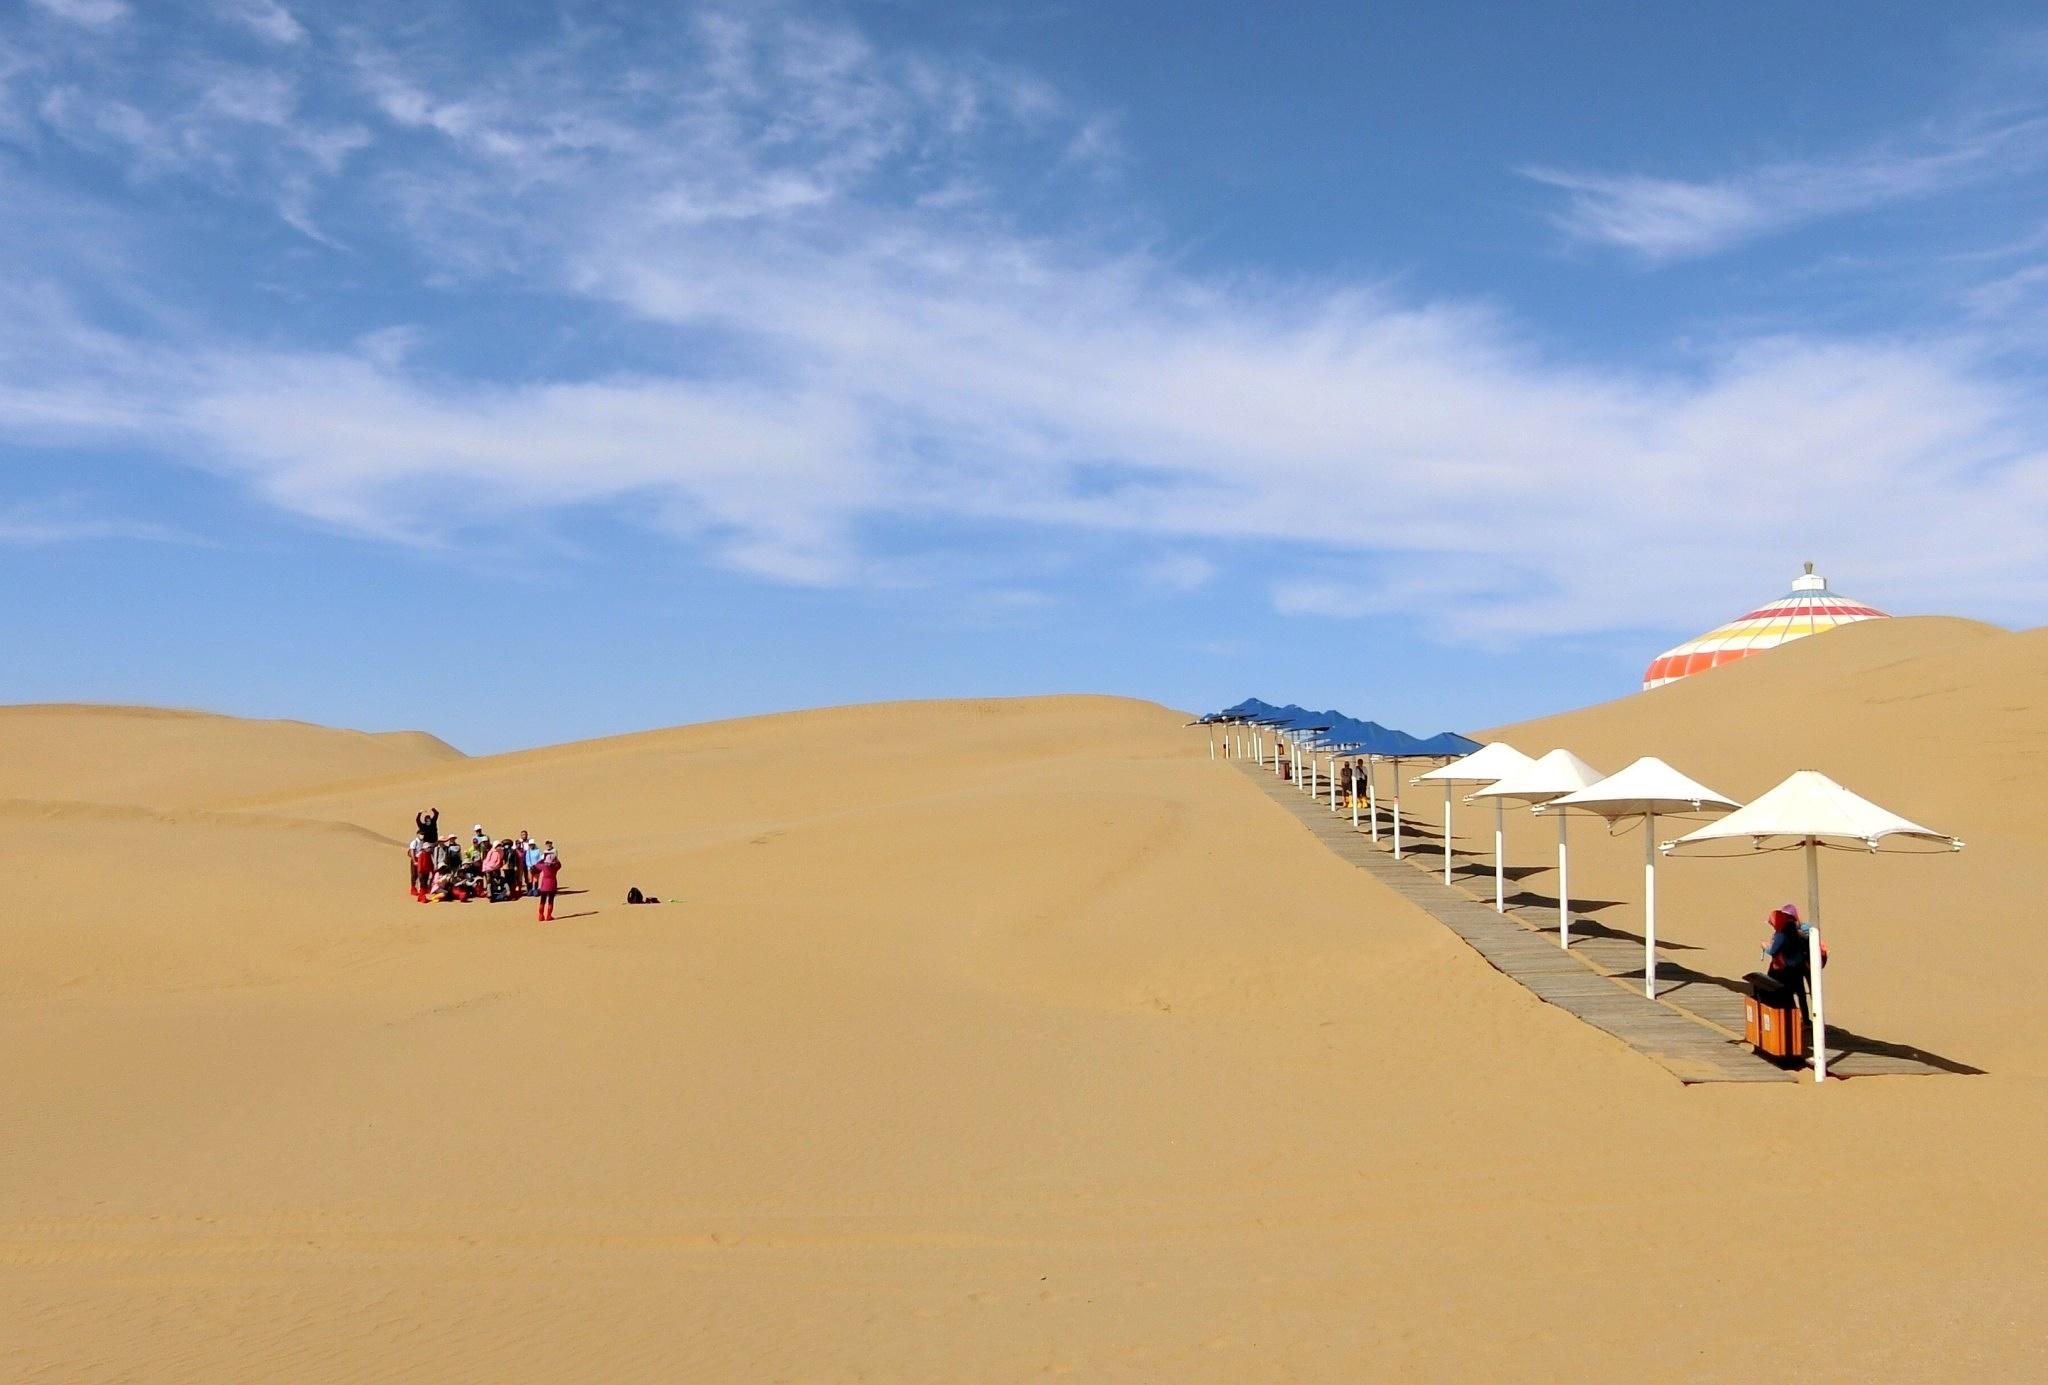 Desert, Xiangshawan, Inner Mongolia by pop88123